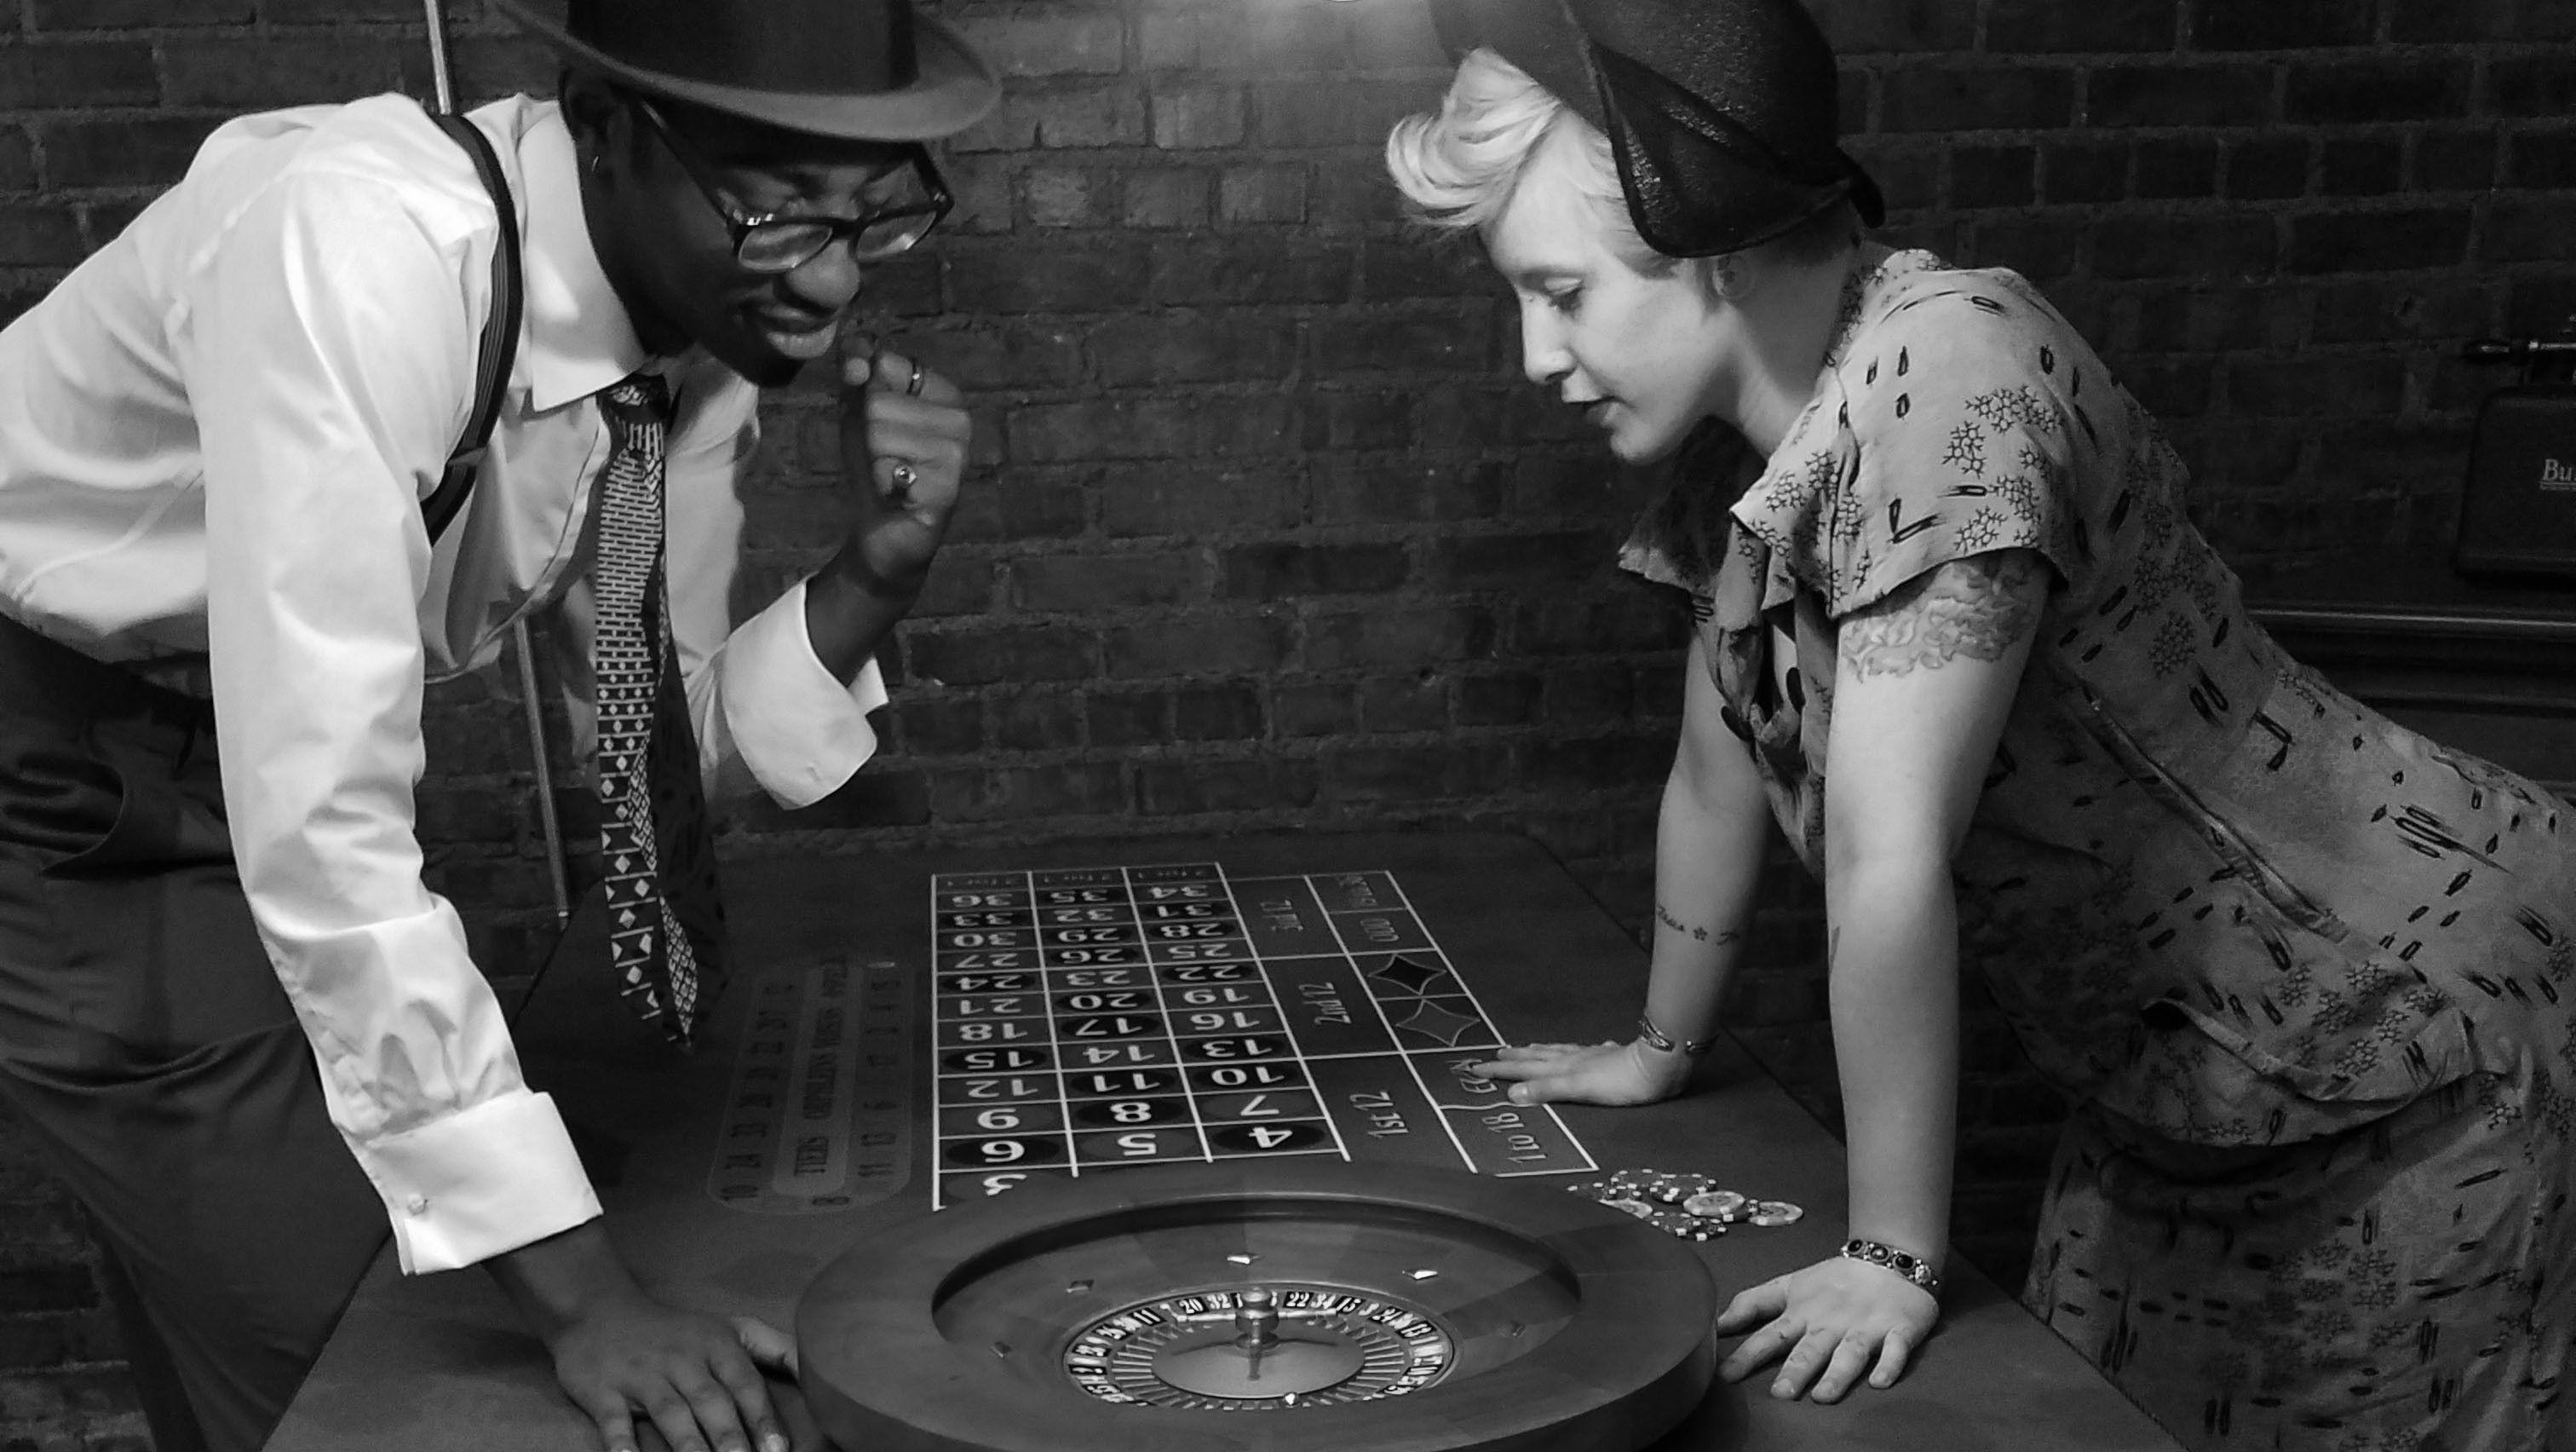 Eliot Ness Investigation Escape Room (1930s detective theme)